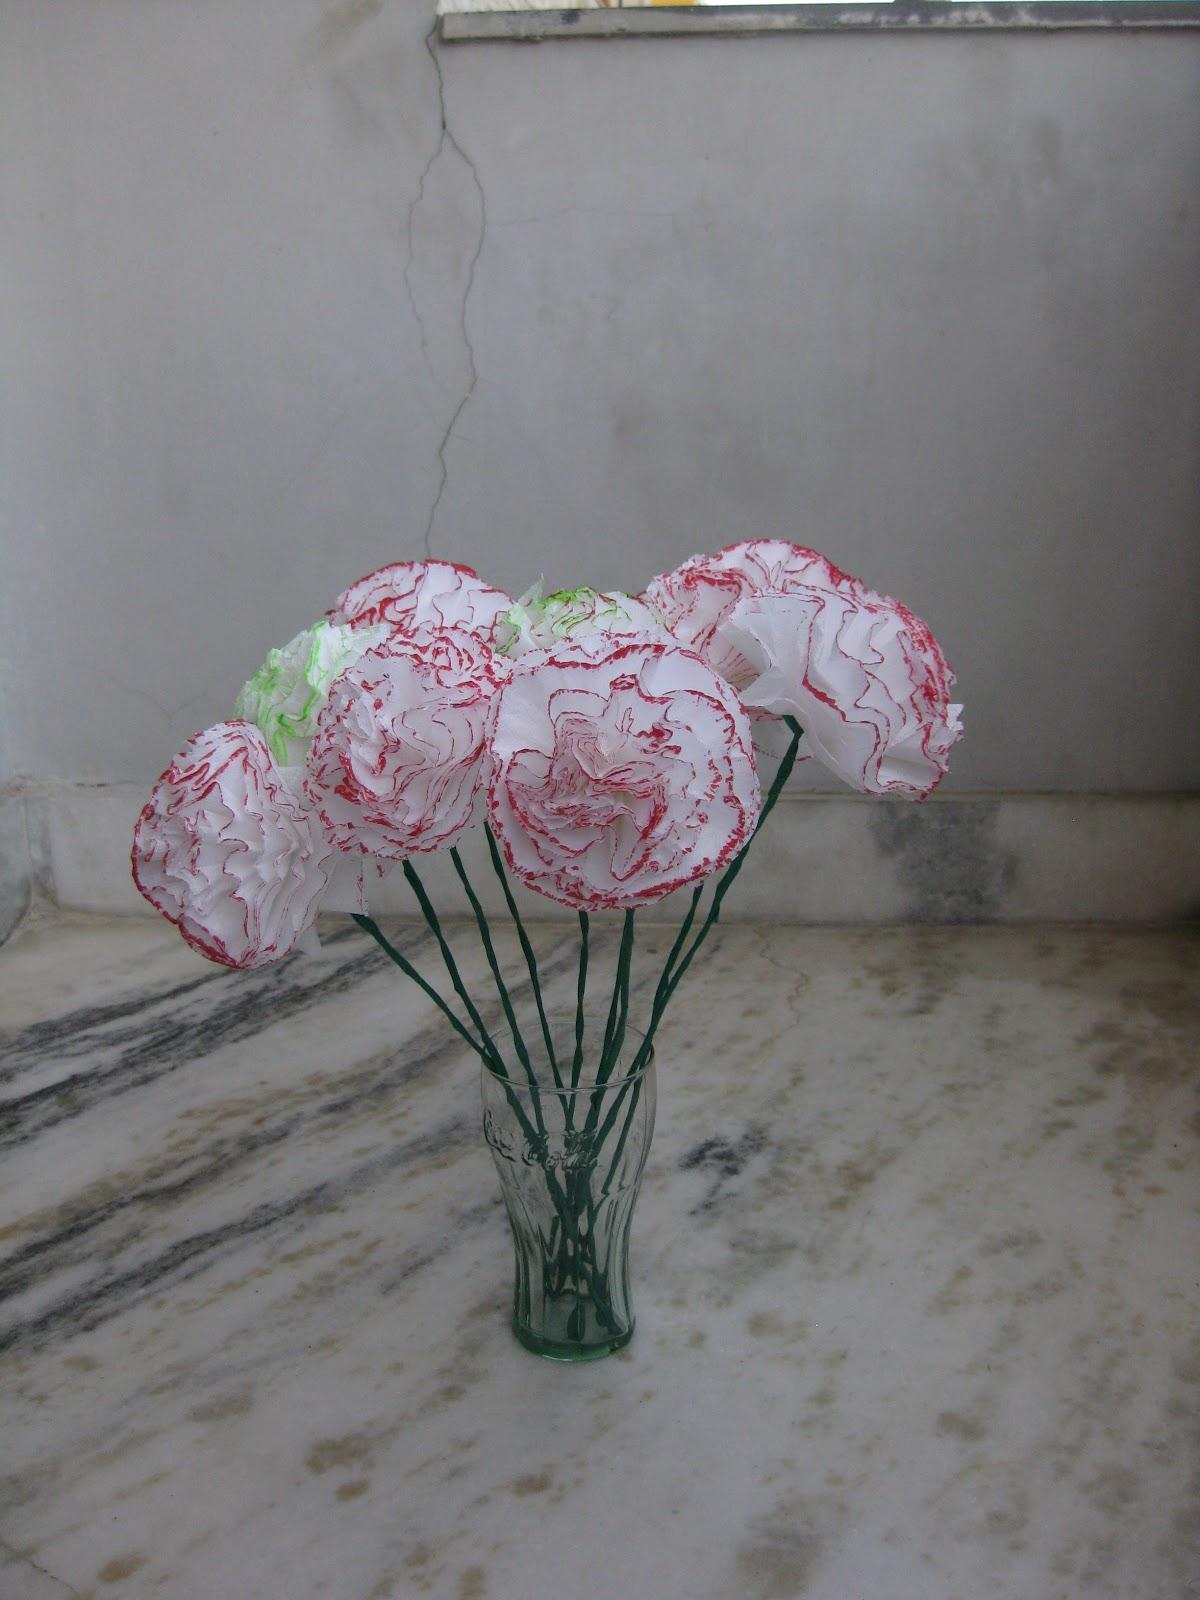 himaja u0026 39 s crafts  tissue paper flower1